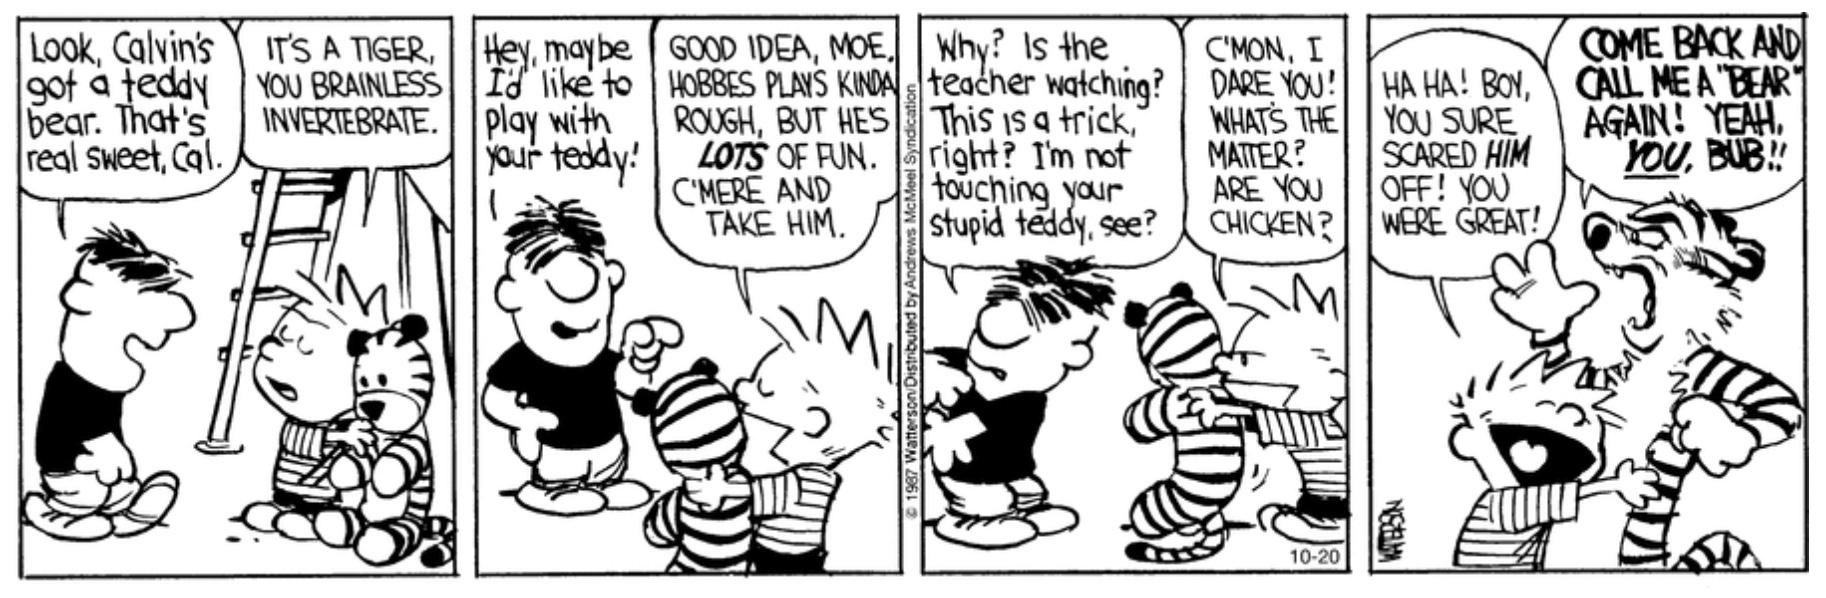 Calvin And Hobbes Page 80 Myfitnesspal